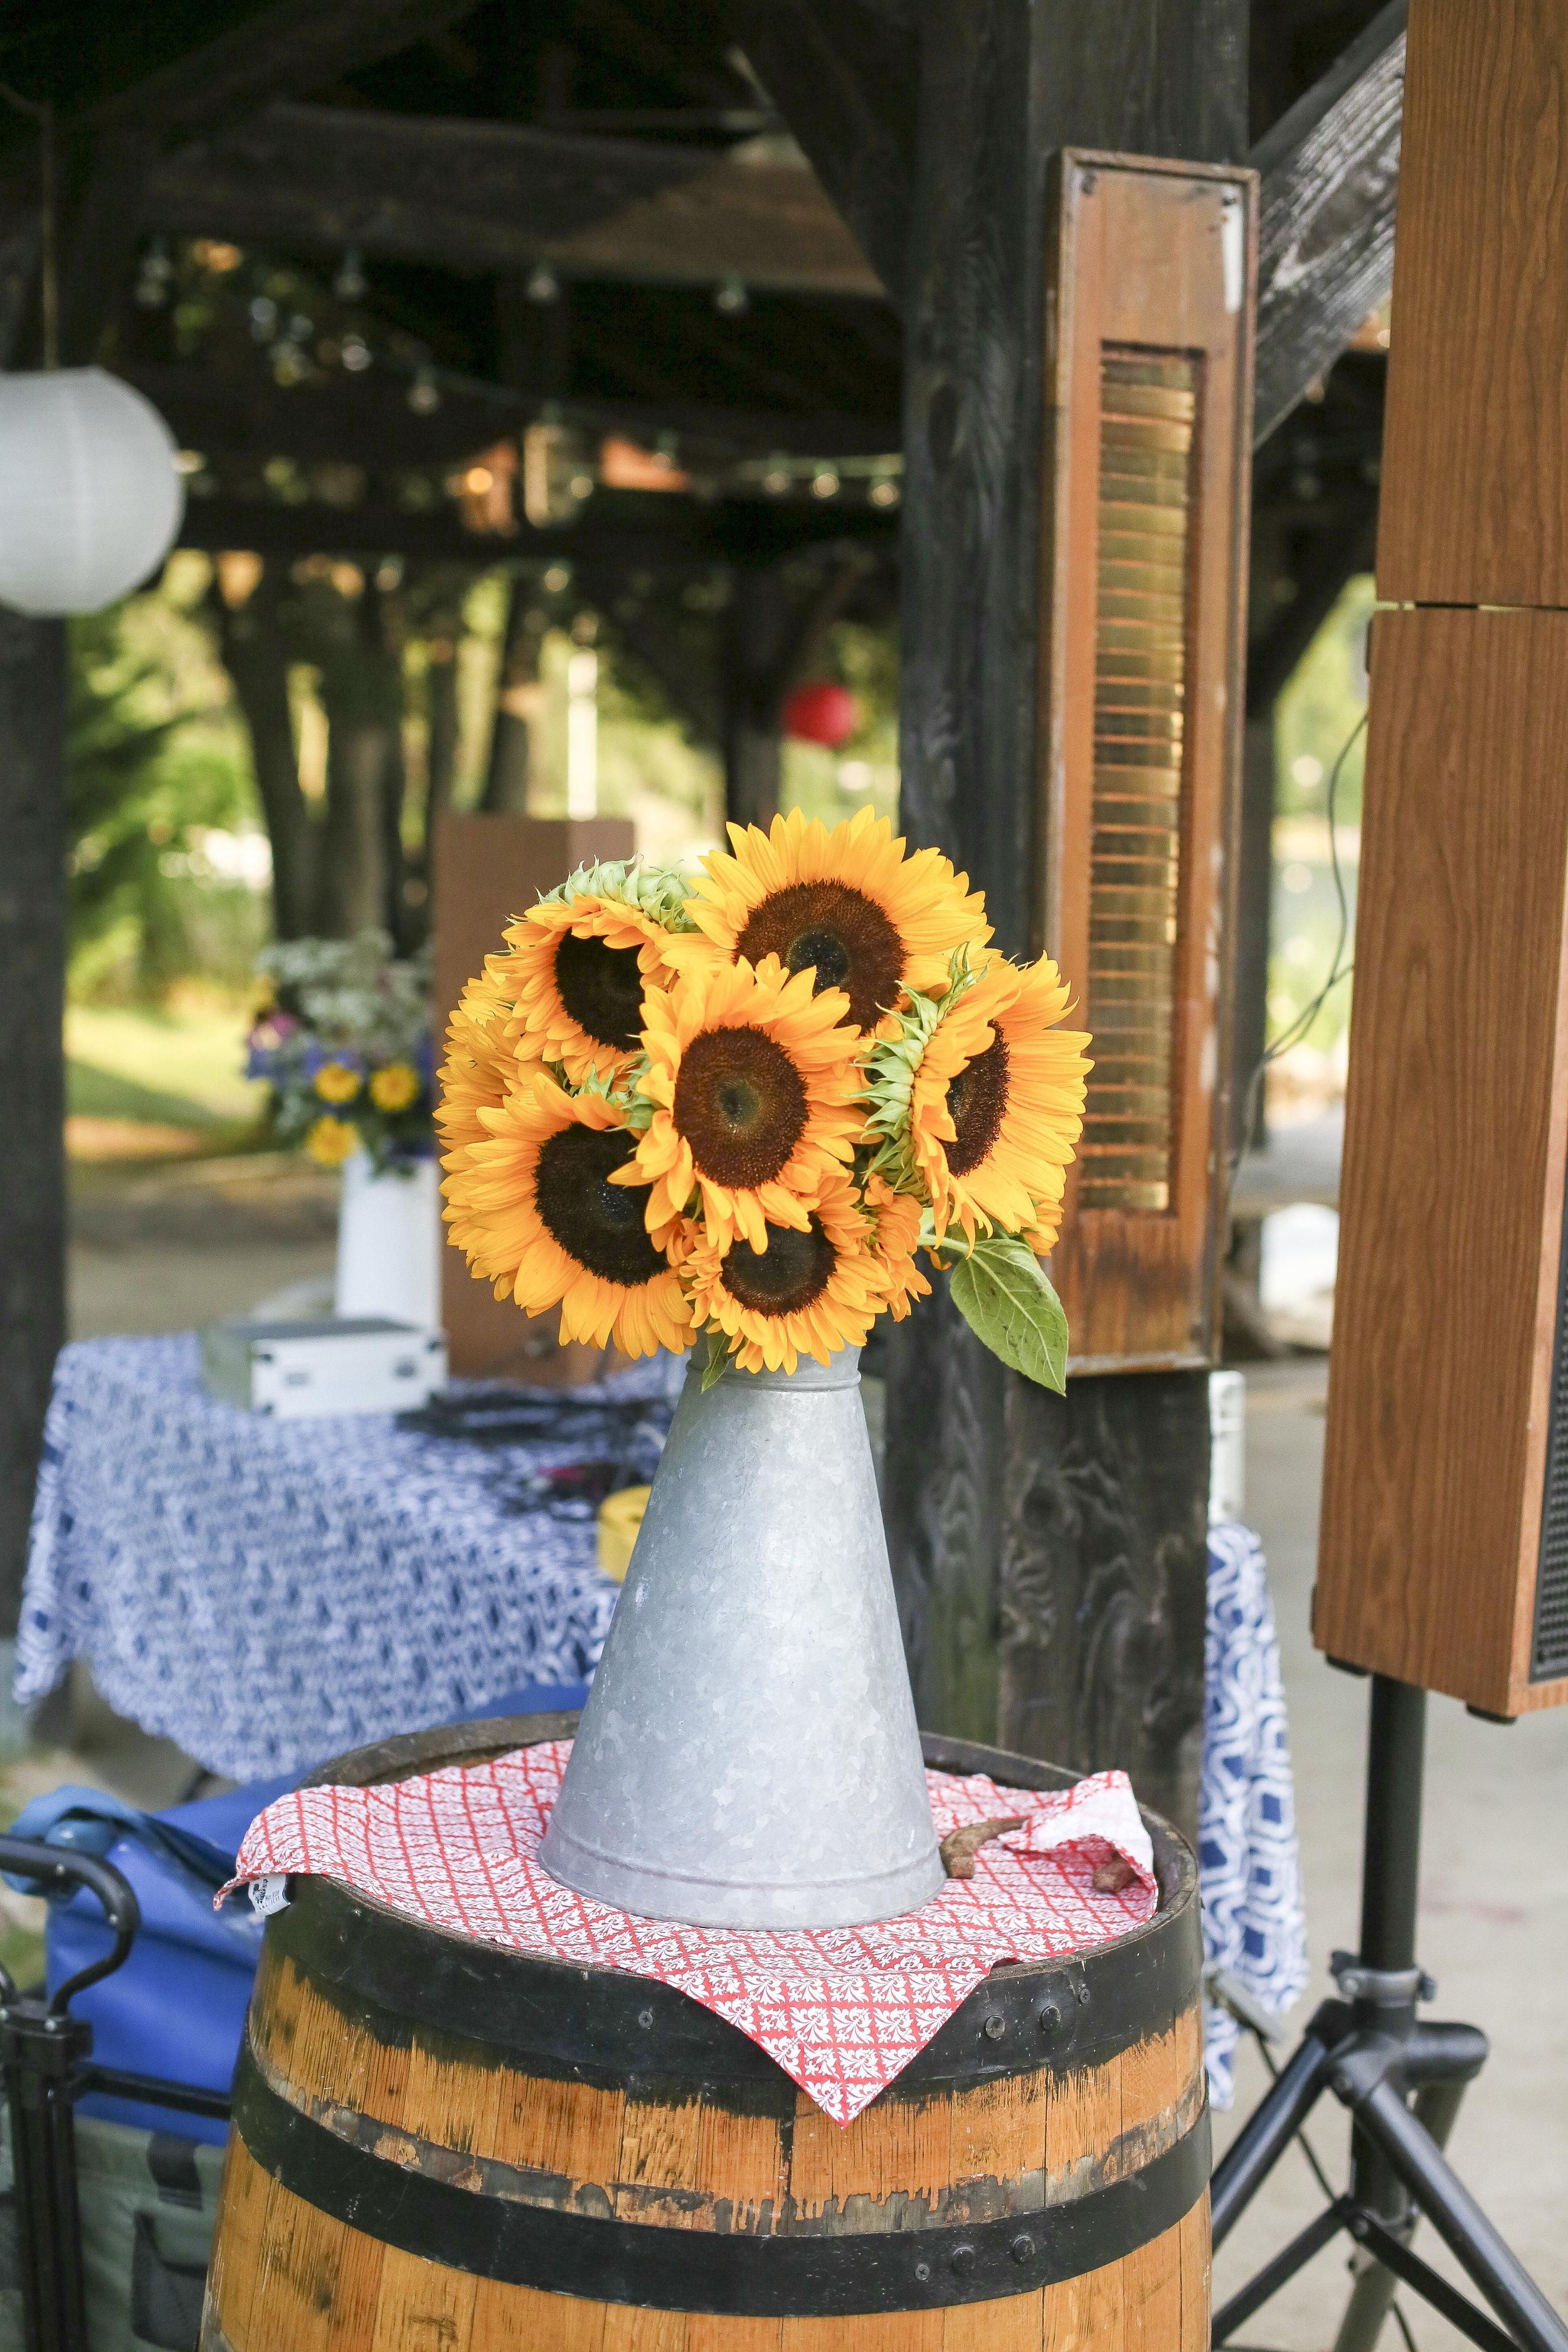 Labory Day Sunflowers.JPG